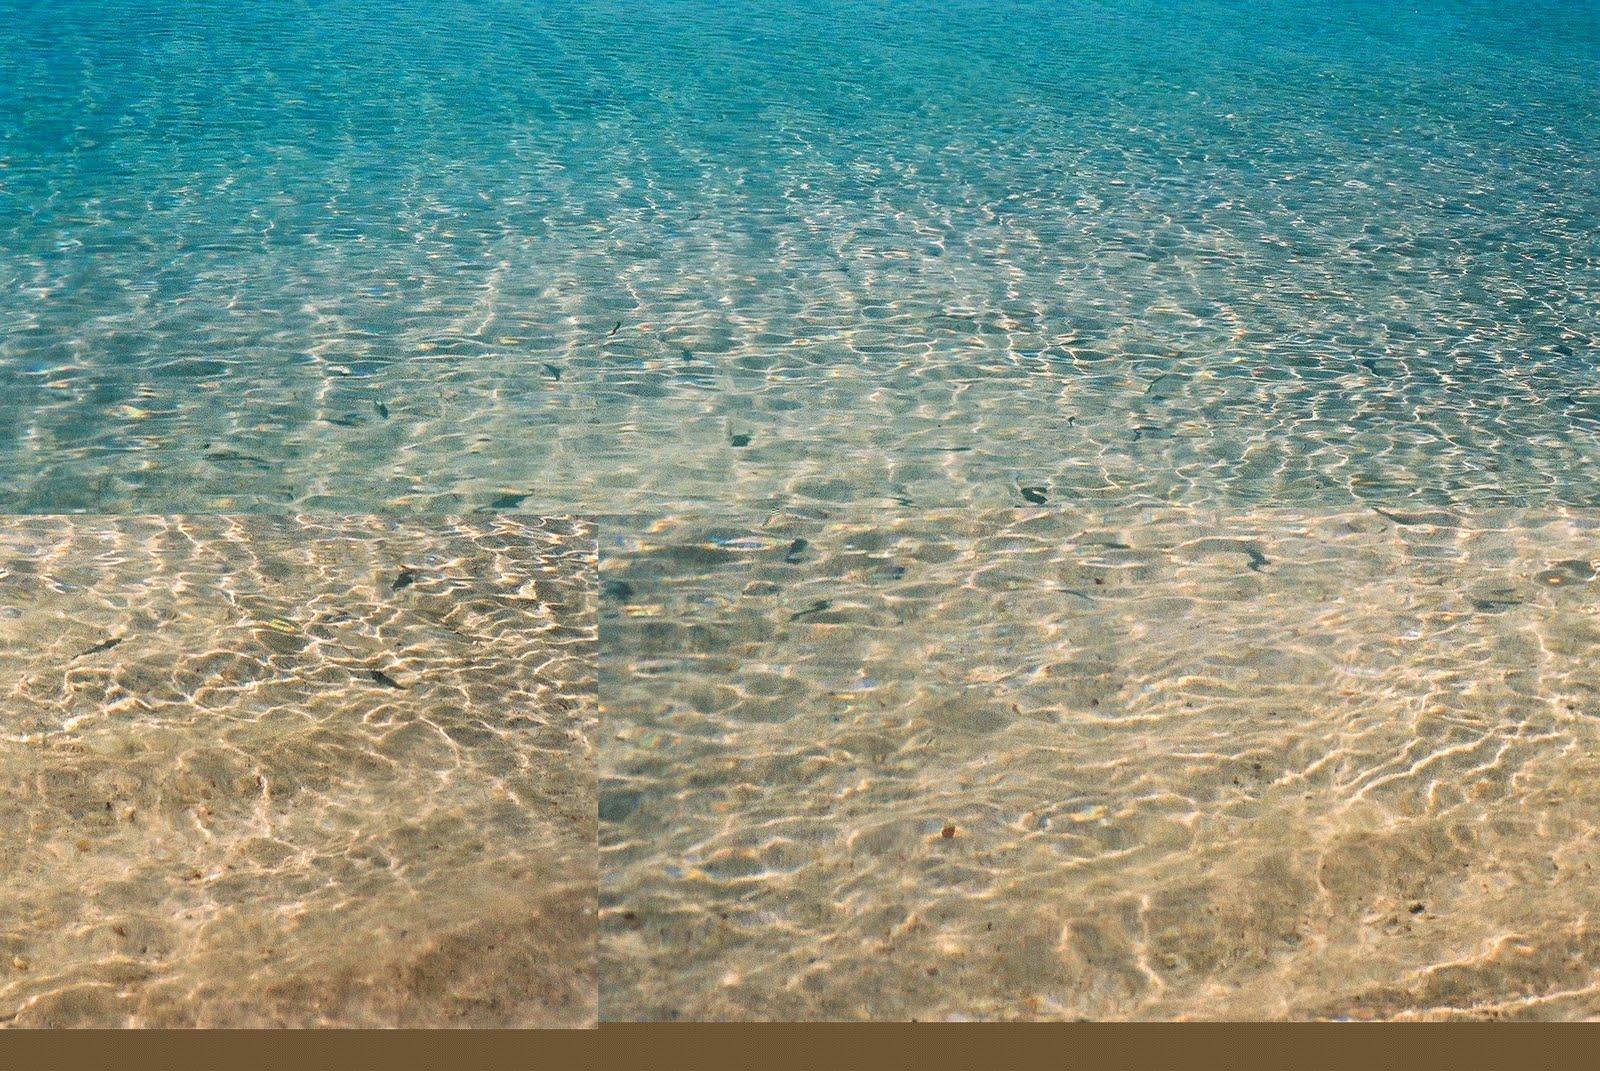 http://2.bp.blogspot.com/-zrXEC1q3f84/TlqMsZjYDcI/AAAAAAAAEeM/Bp6e54lV_qE/s1600/Caribbean-Sea.jpg